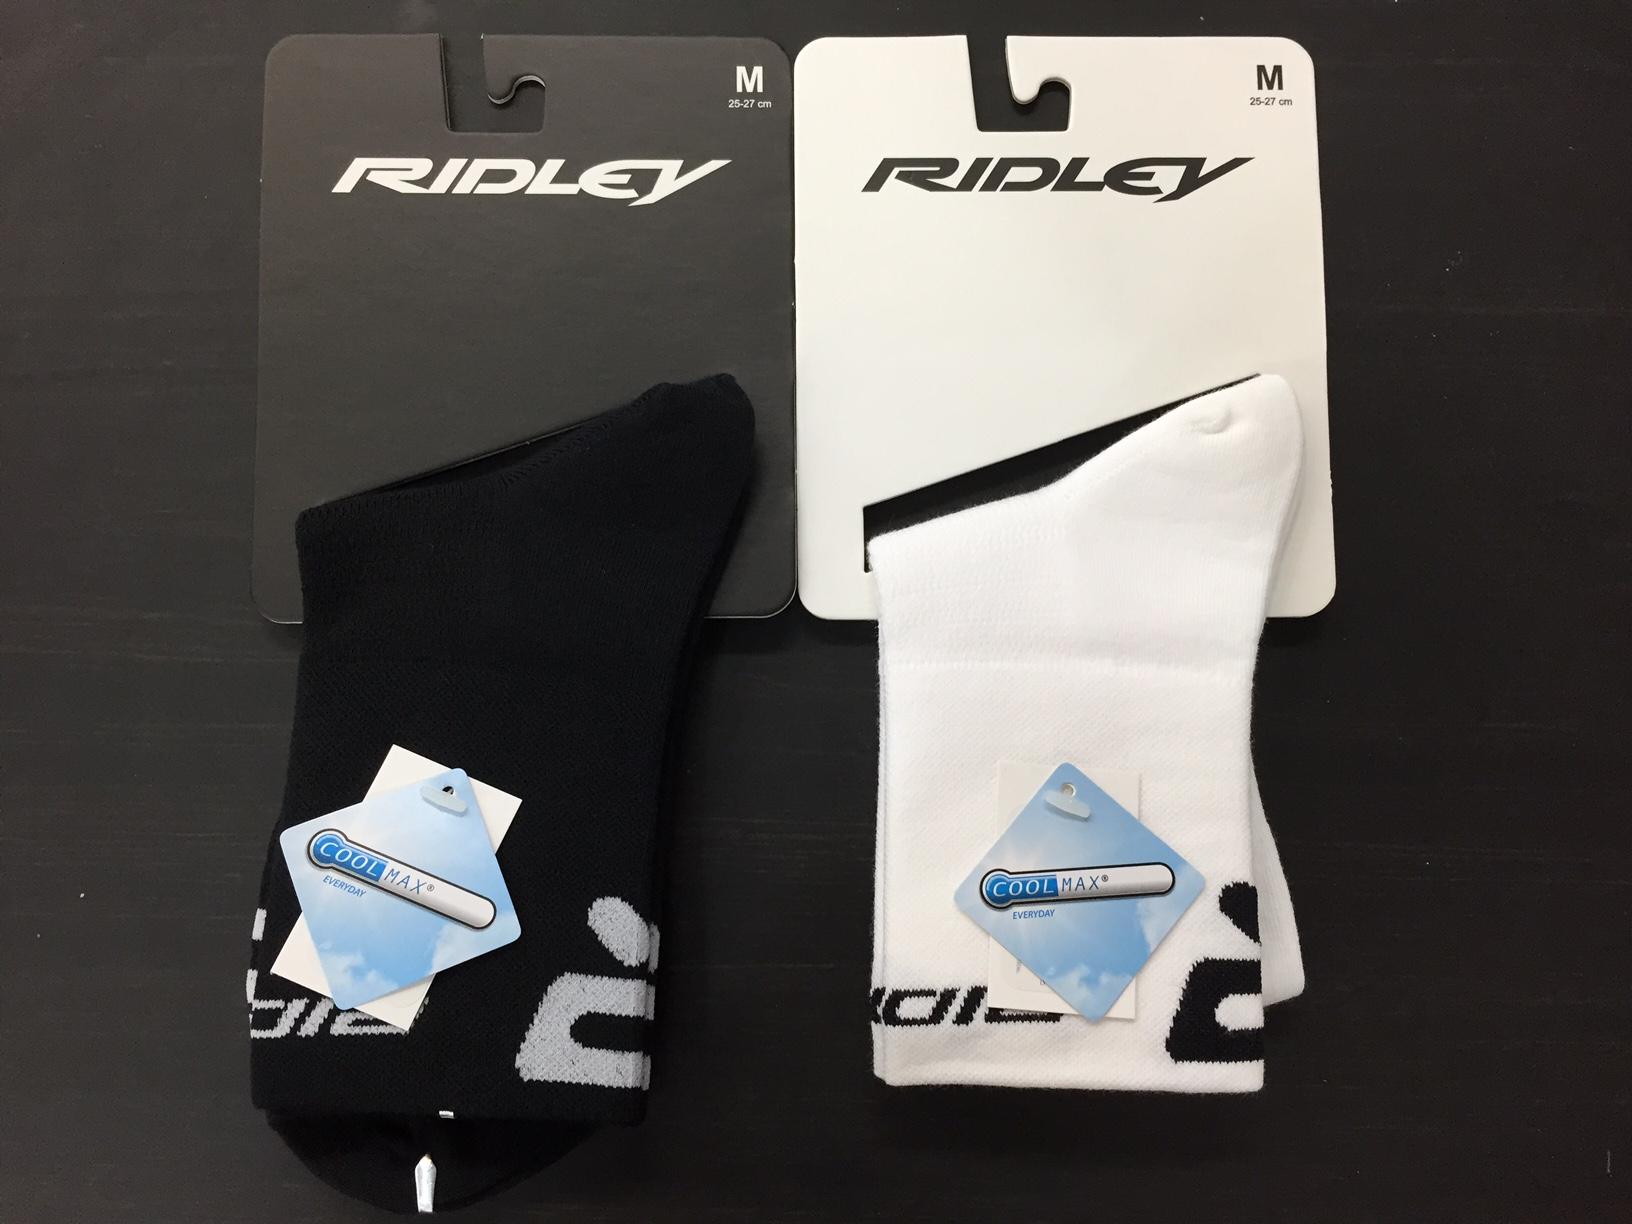 RIDLEY-SOCKS-1.jpg